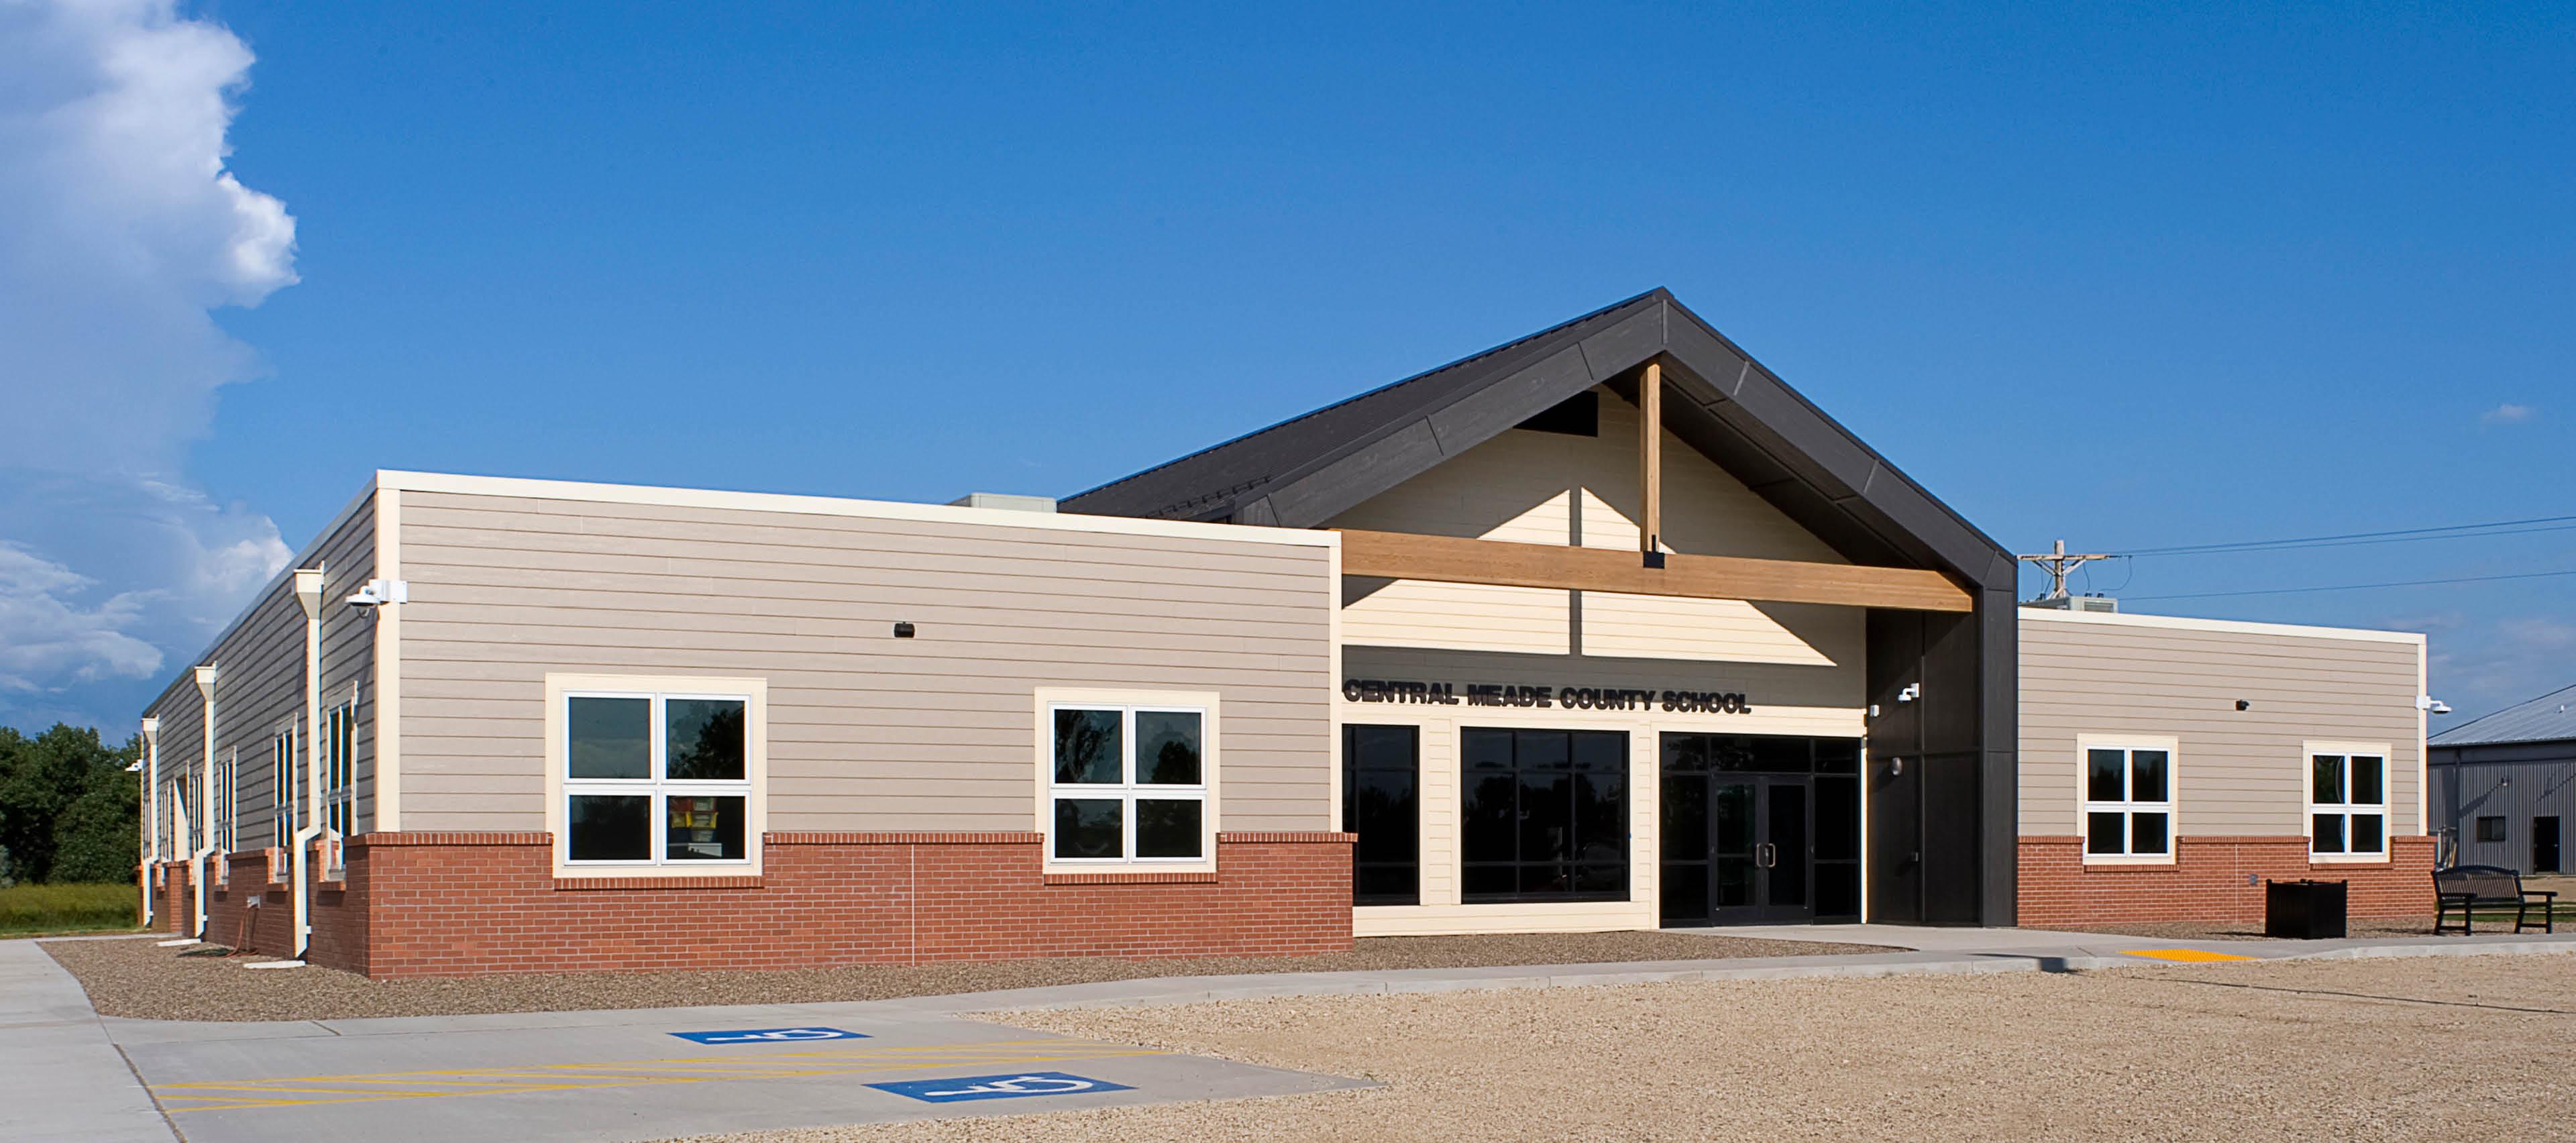 County School